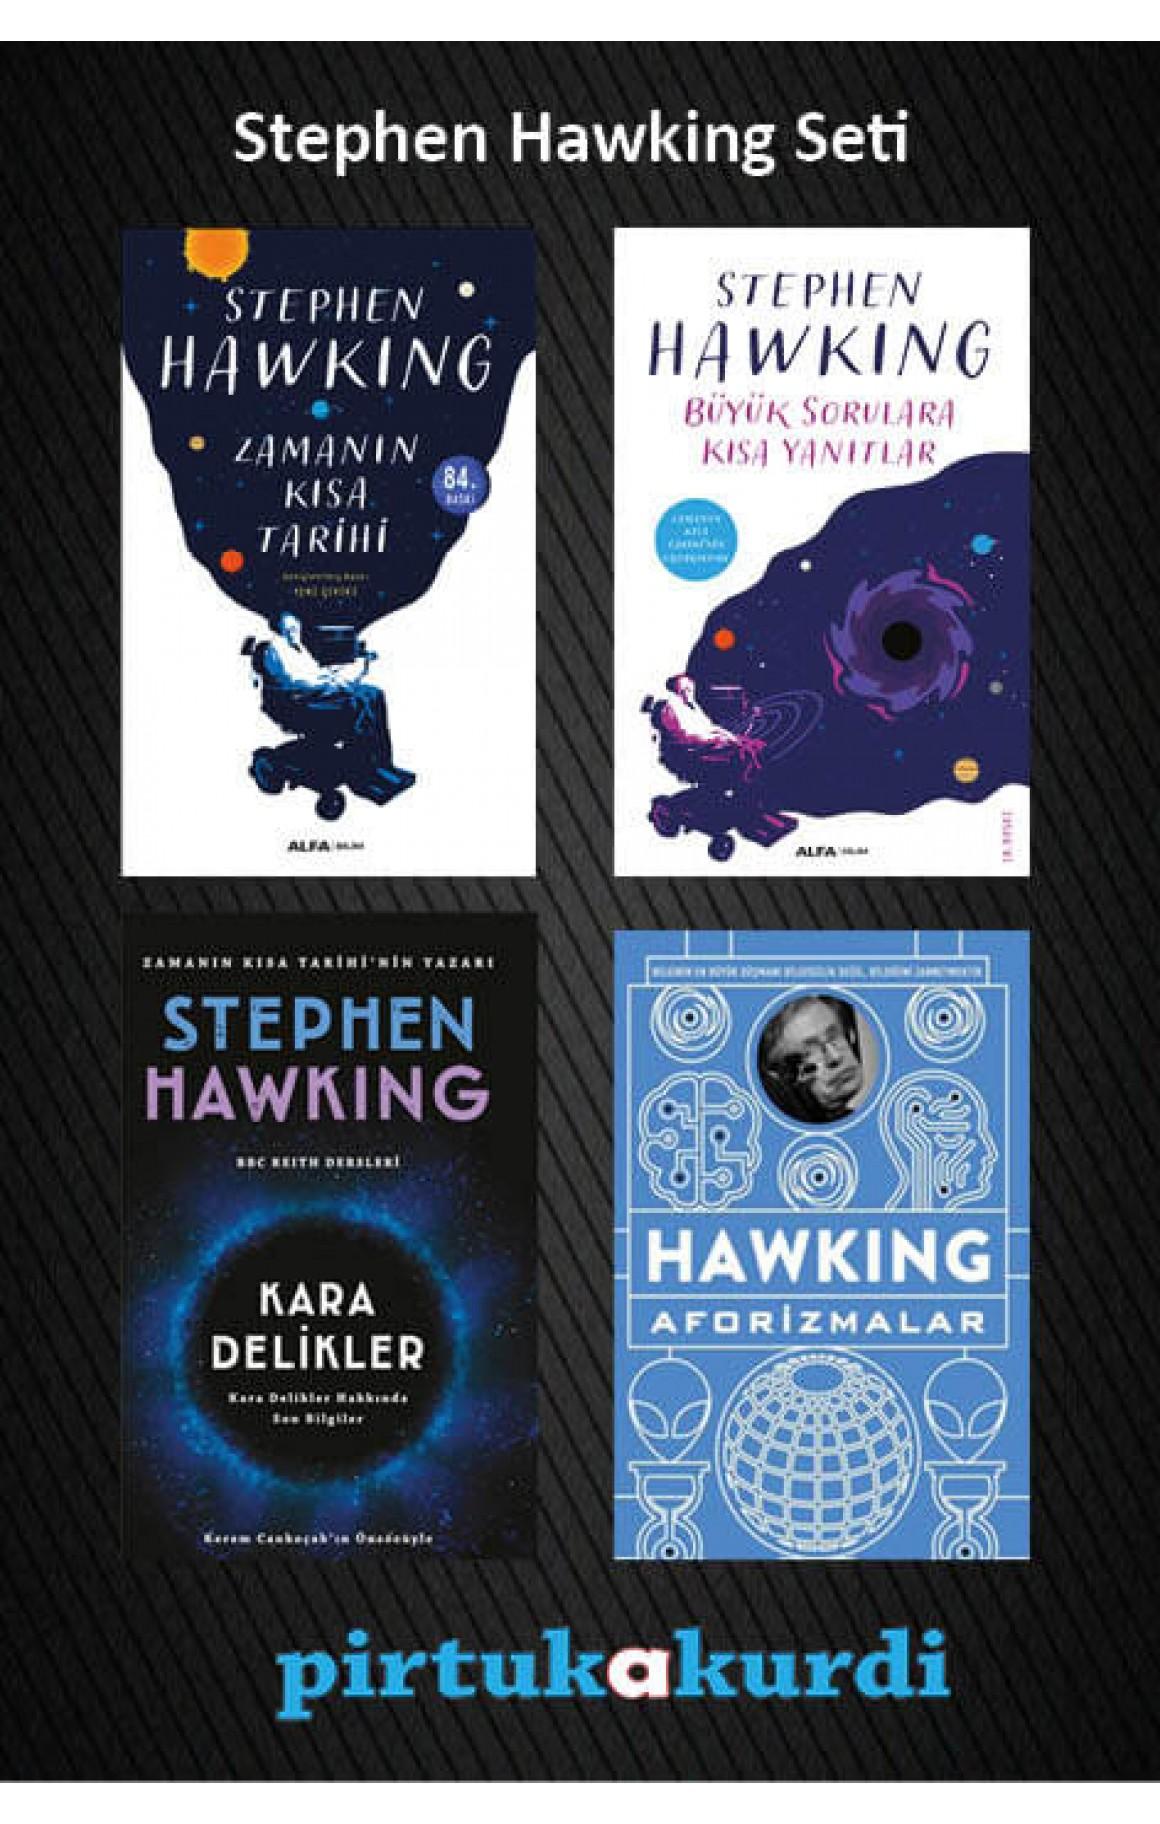 Stephen Hawking Seti